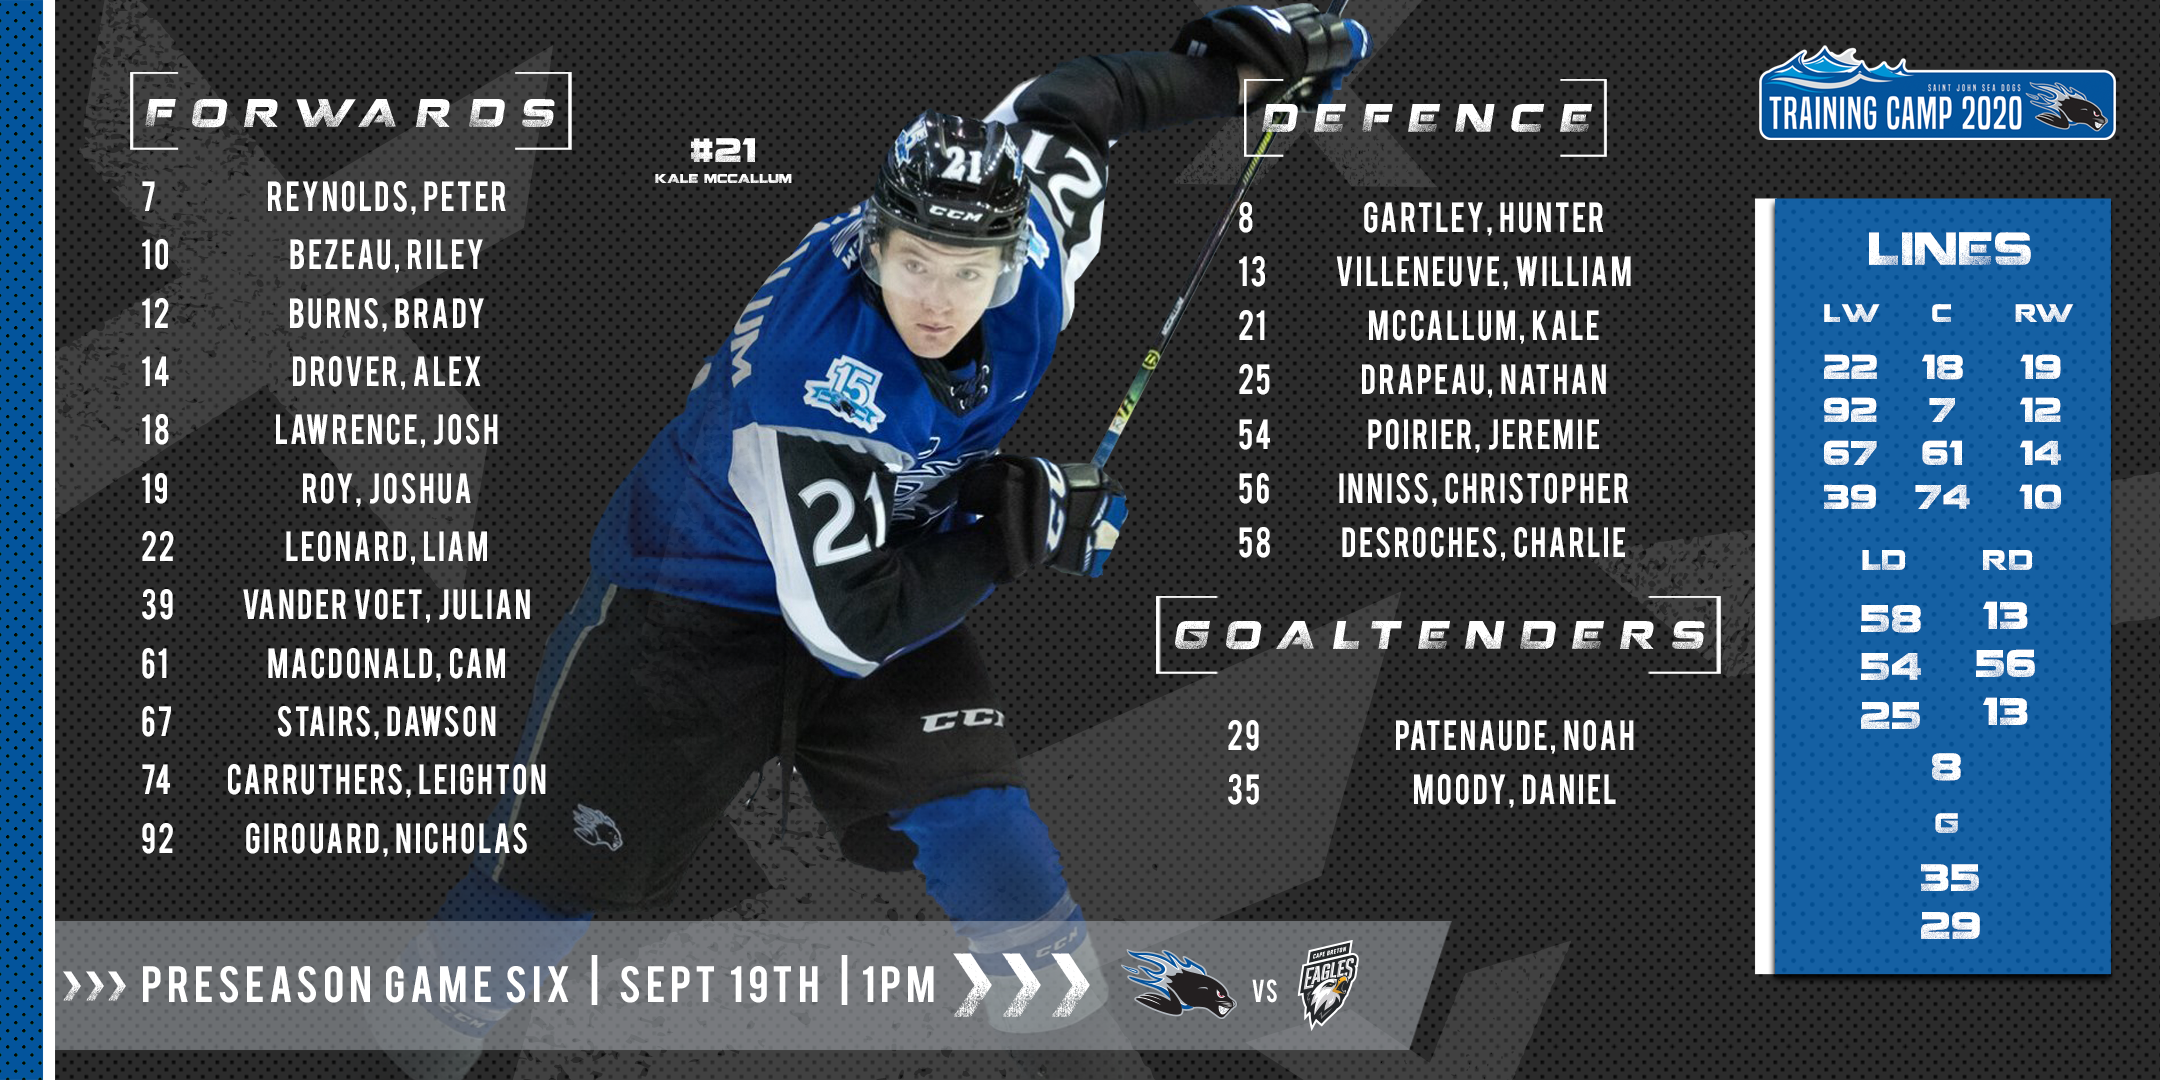 Lineup Sept 19